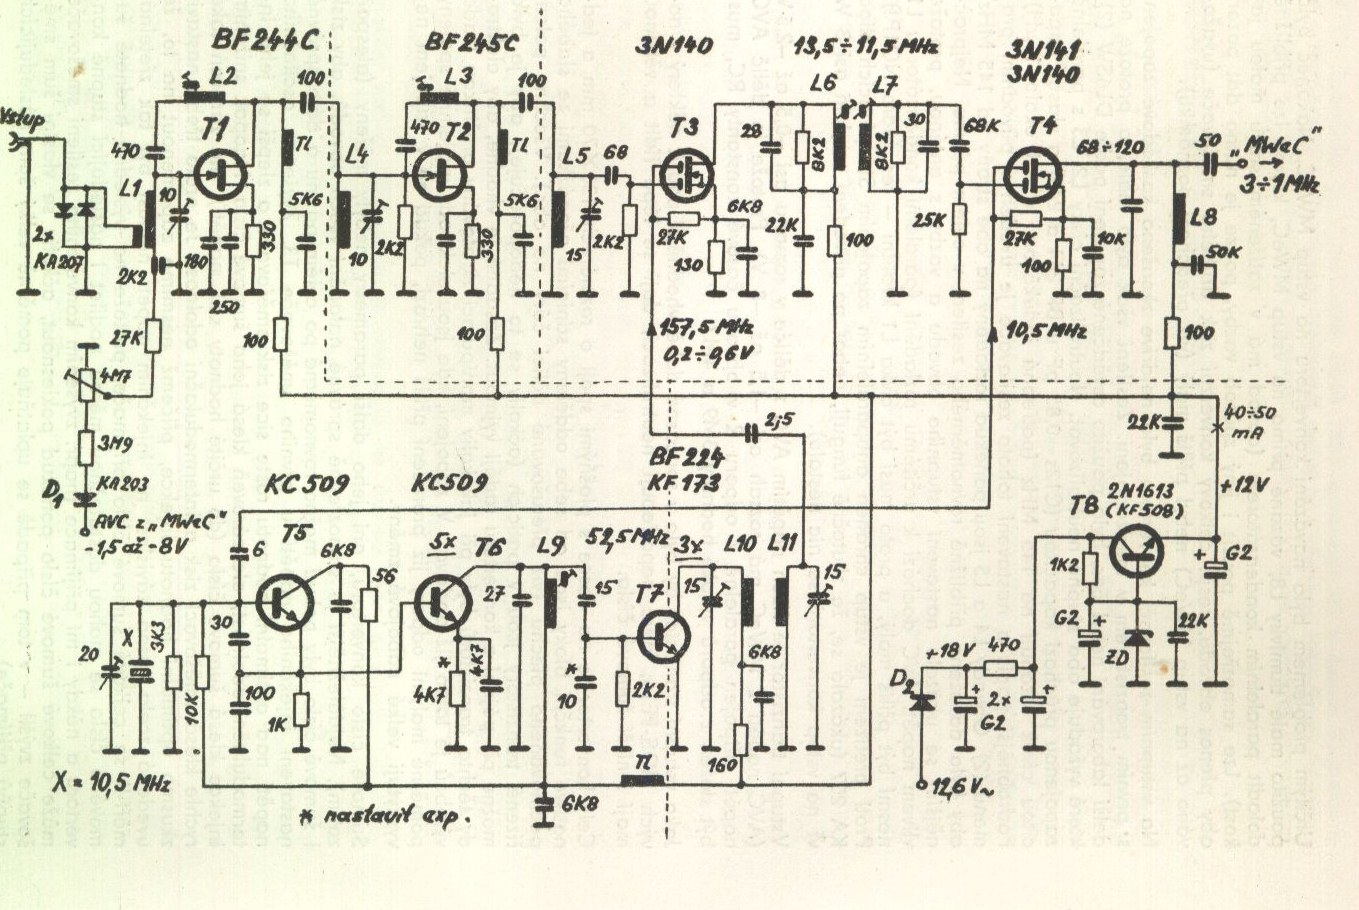 Strnky Spolku Cb Jilemnice 80 To 135 Mhz Am Fm Vhf Receiver Circuit Board Design Kliknte Pro Zvten